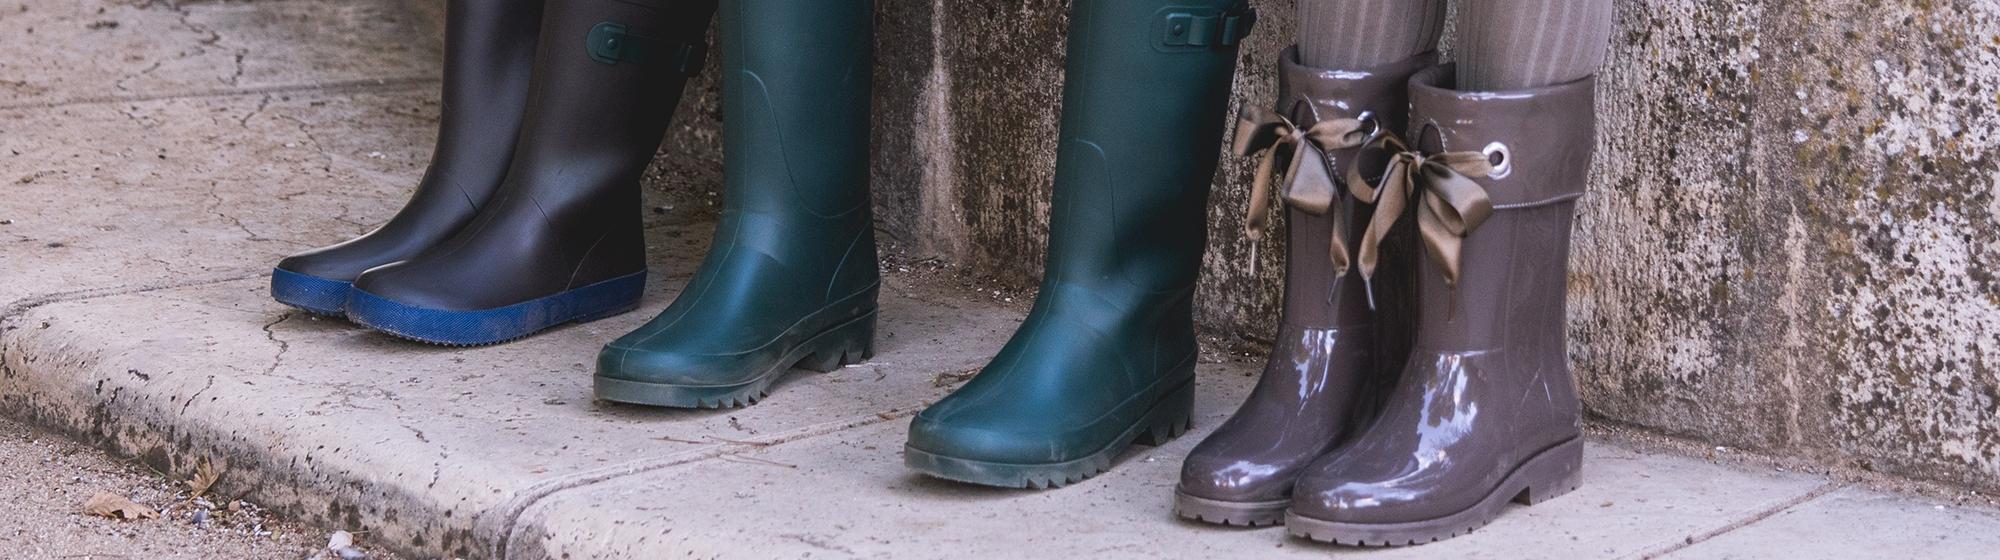 c58c48293 Botas de agua niña. Katiuskas y botas de lluvia